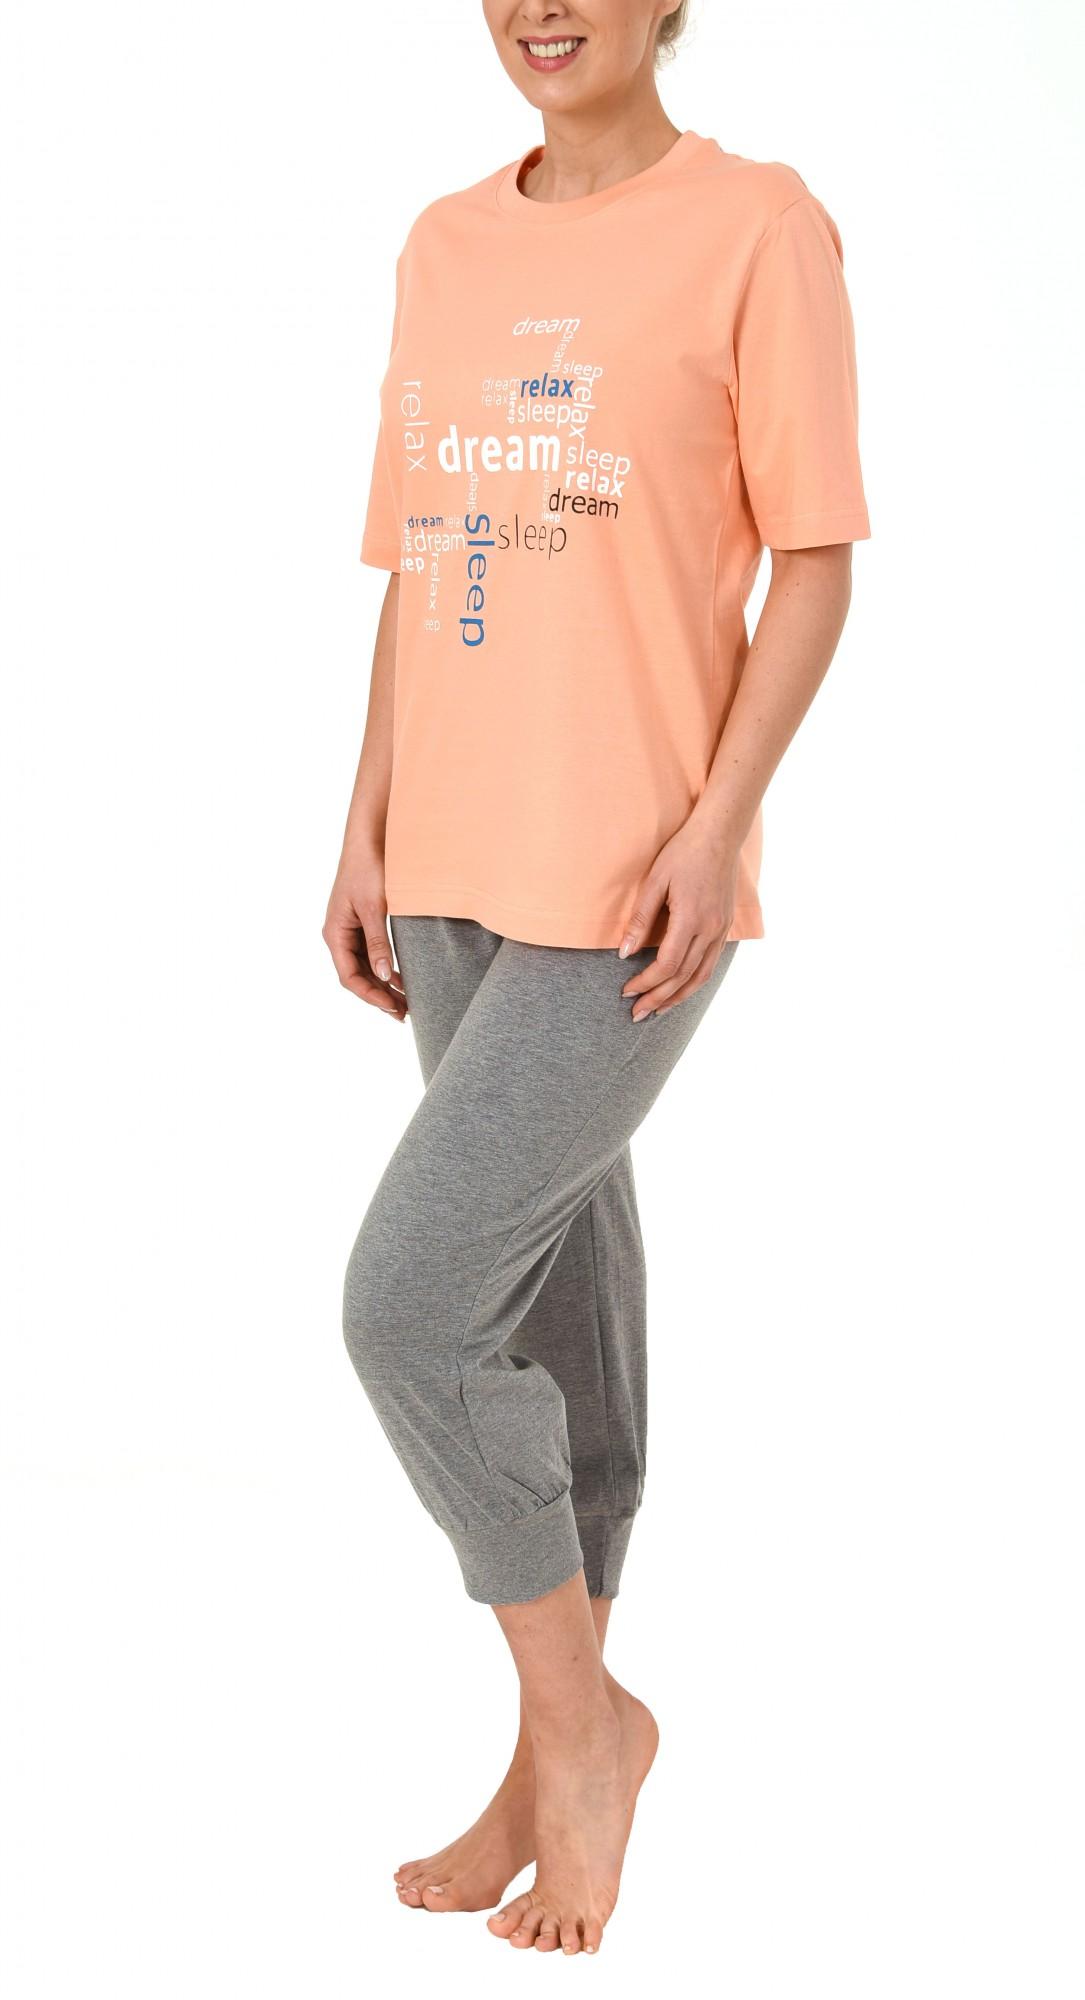 Damen Capri Pyjama 7/8-lange Hose und kurzarm Oberteil – 60657 – Bild 3